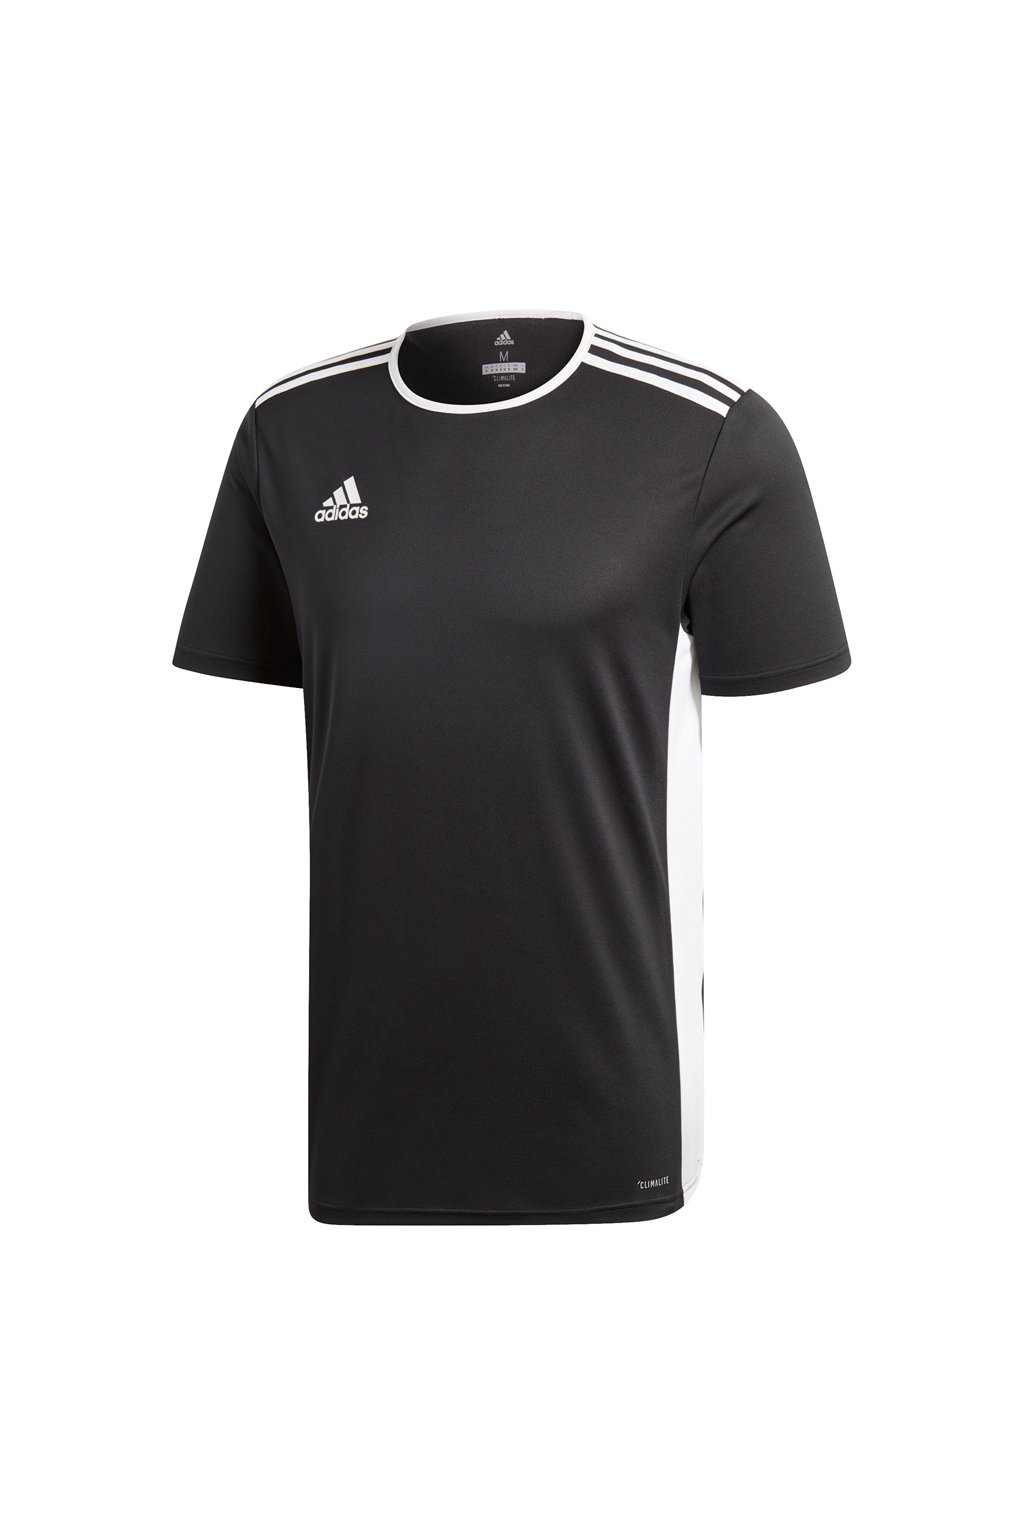 Detské tričko Adidas Entrada 18 Jersey JUNIOR čierne CF1035